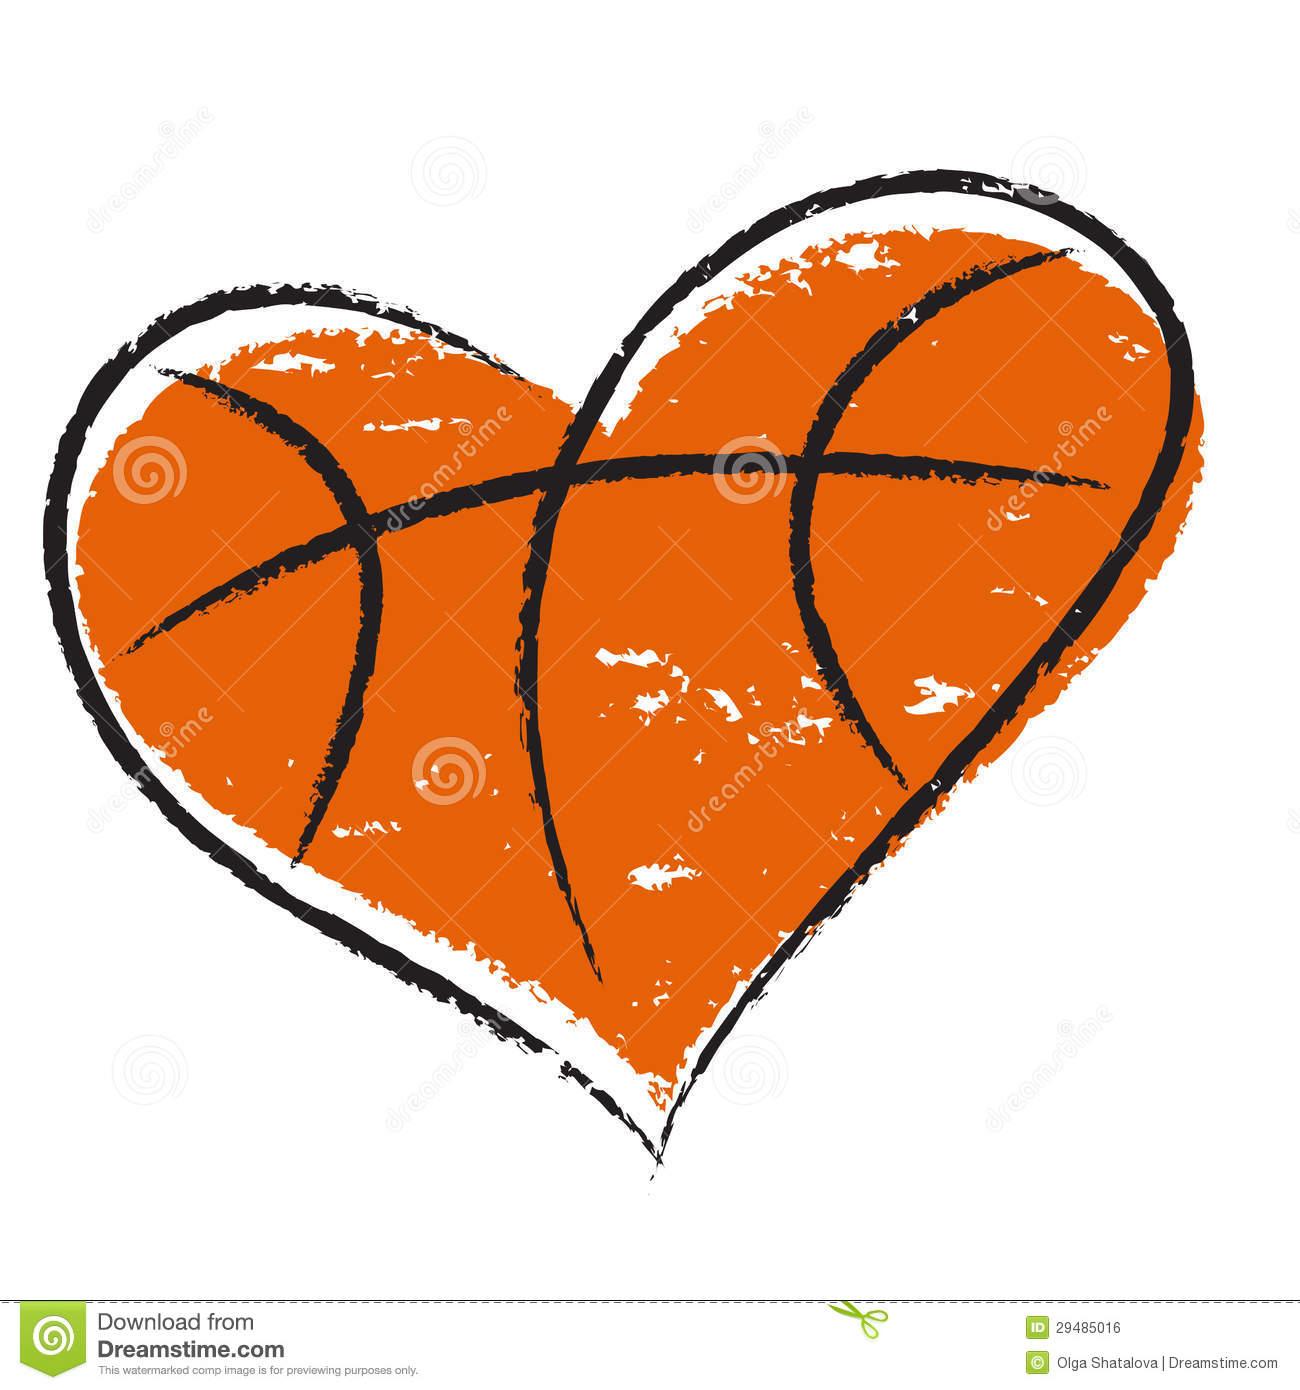 Basketball Heart Clipart - Clipart Kid